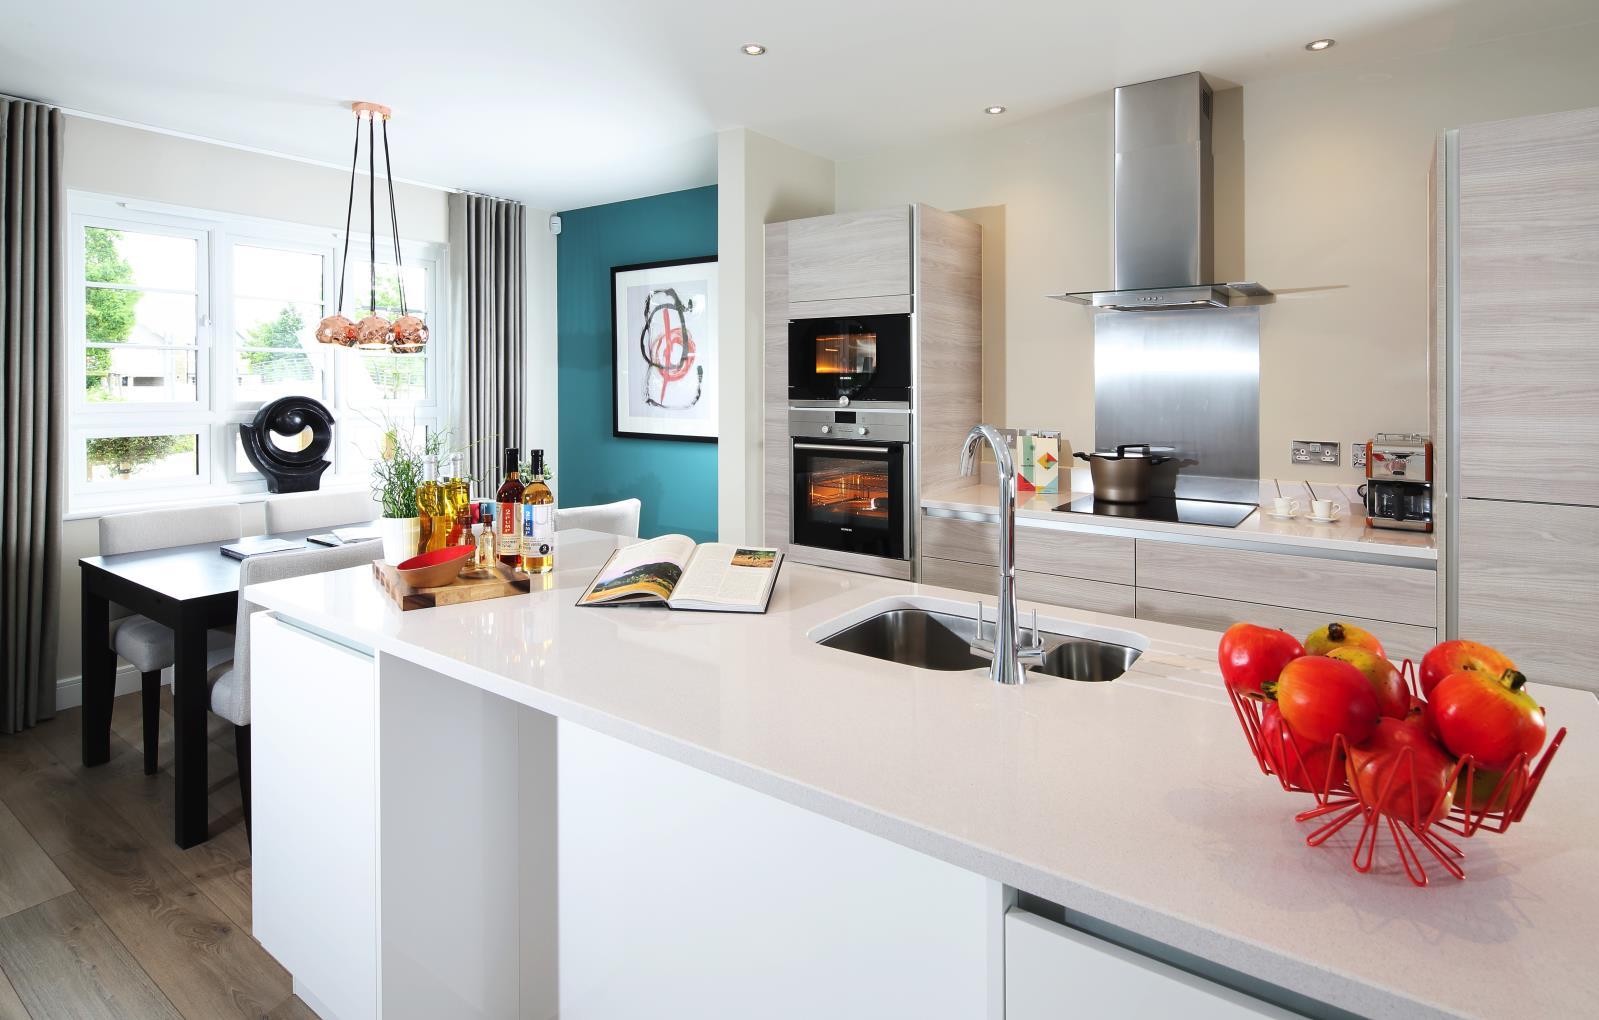 abode-st-neots-living-kitchen-30109-medium